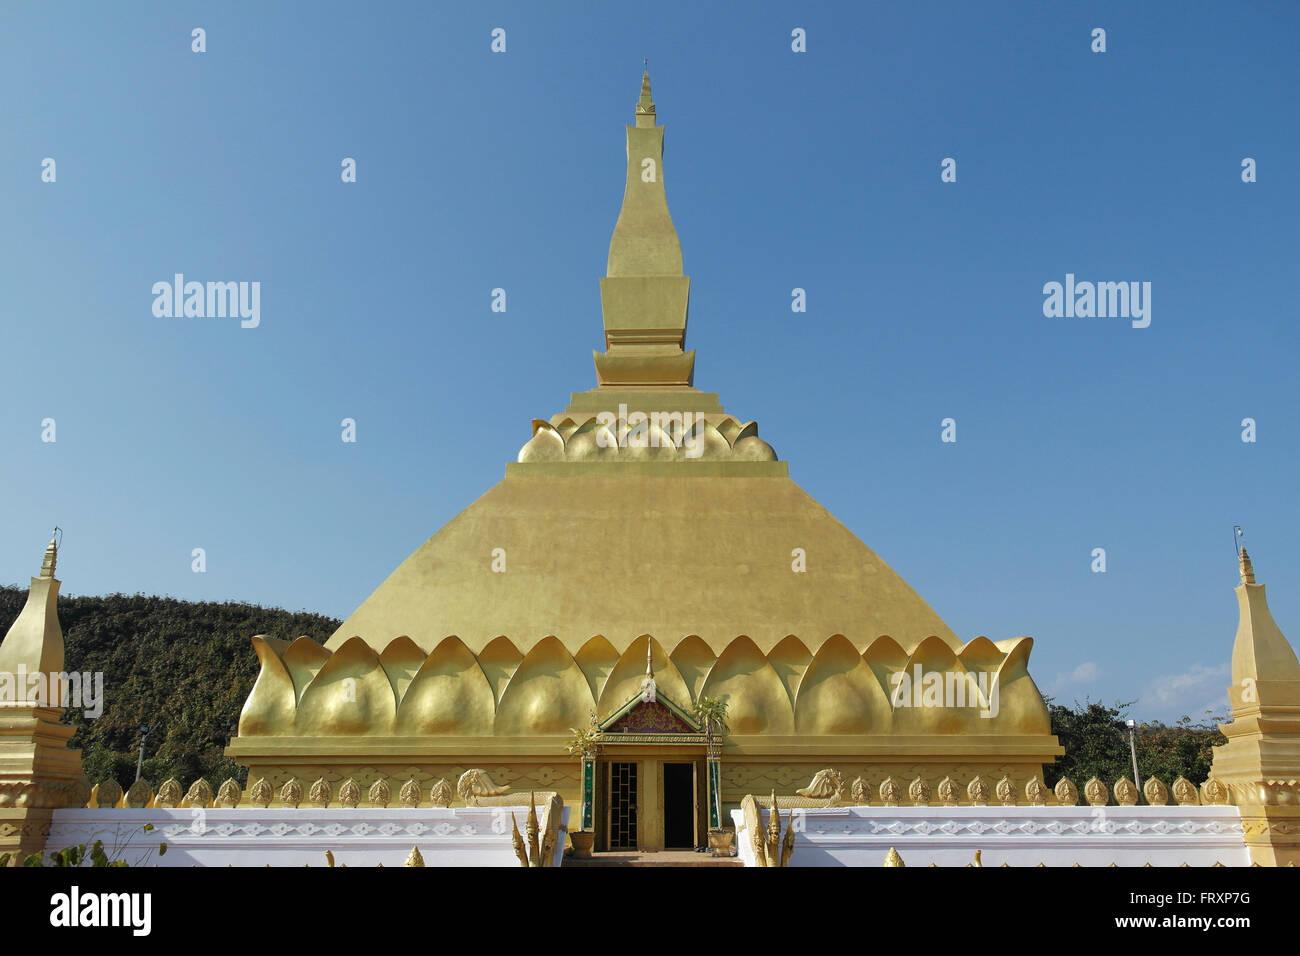 Golden Pagoda in Luang Namtha - Laos - Stock Image